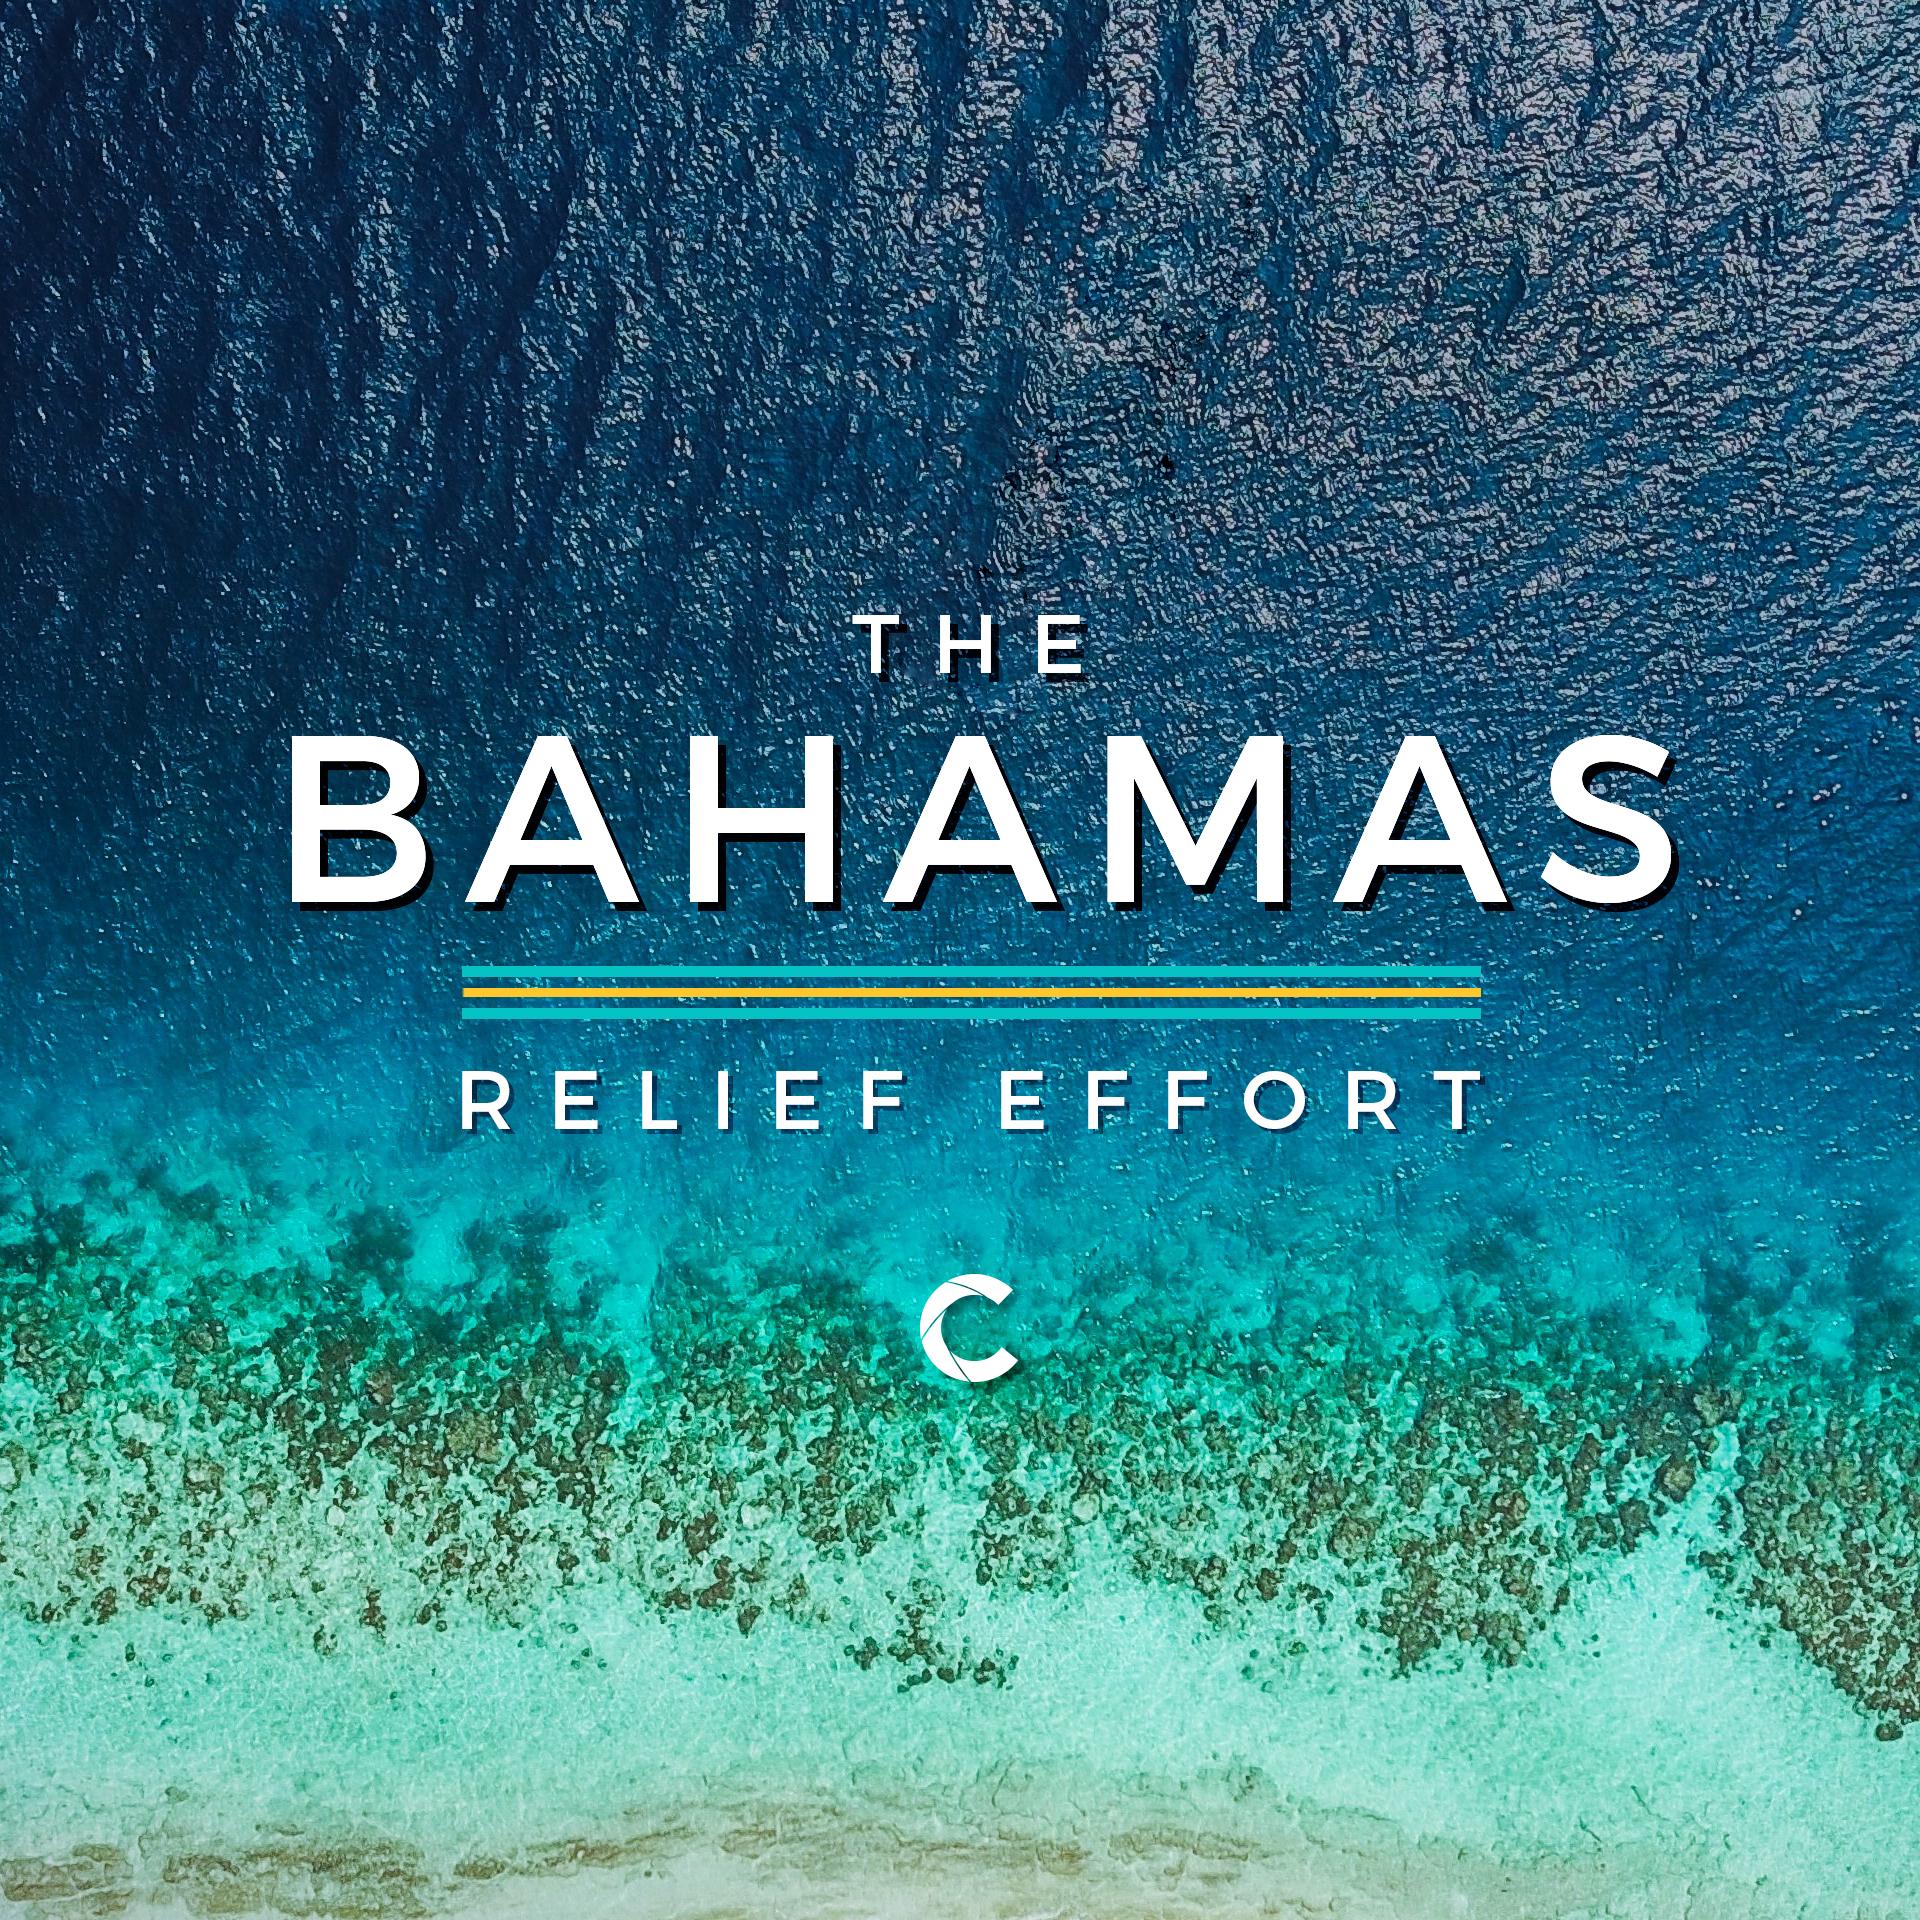 Bahamas Relief_v2B.jpg